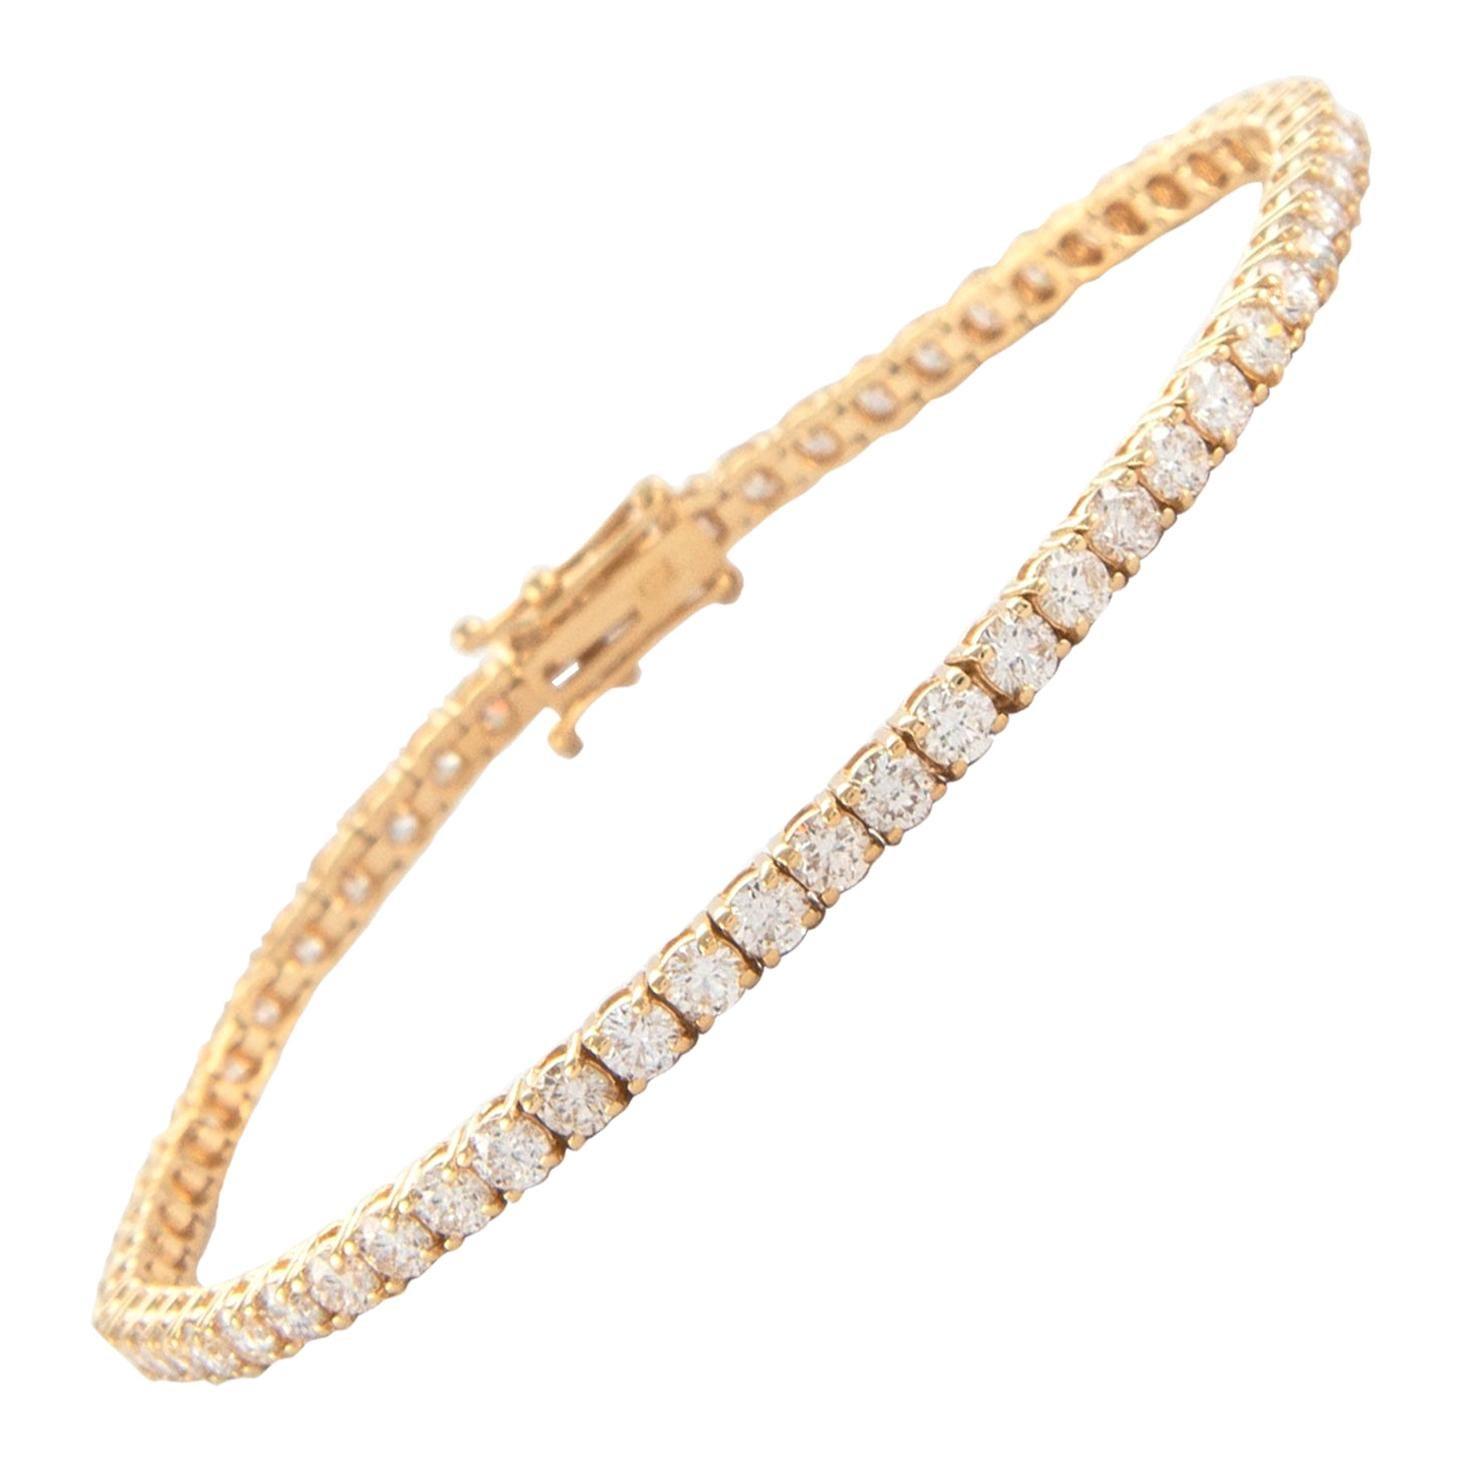 Alexander 5.41 Carat Diamond Tennis Bracelet 18 Karat Yellow Gold